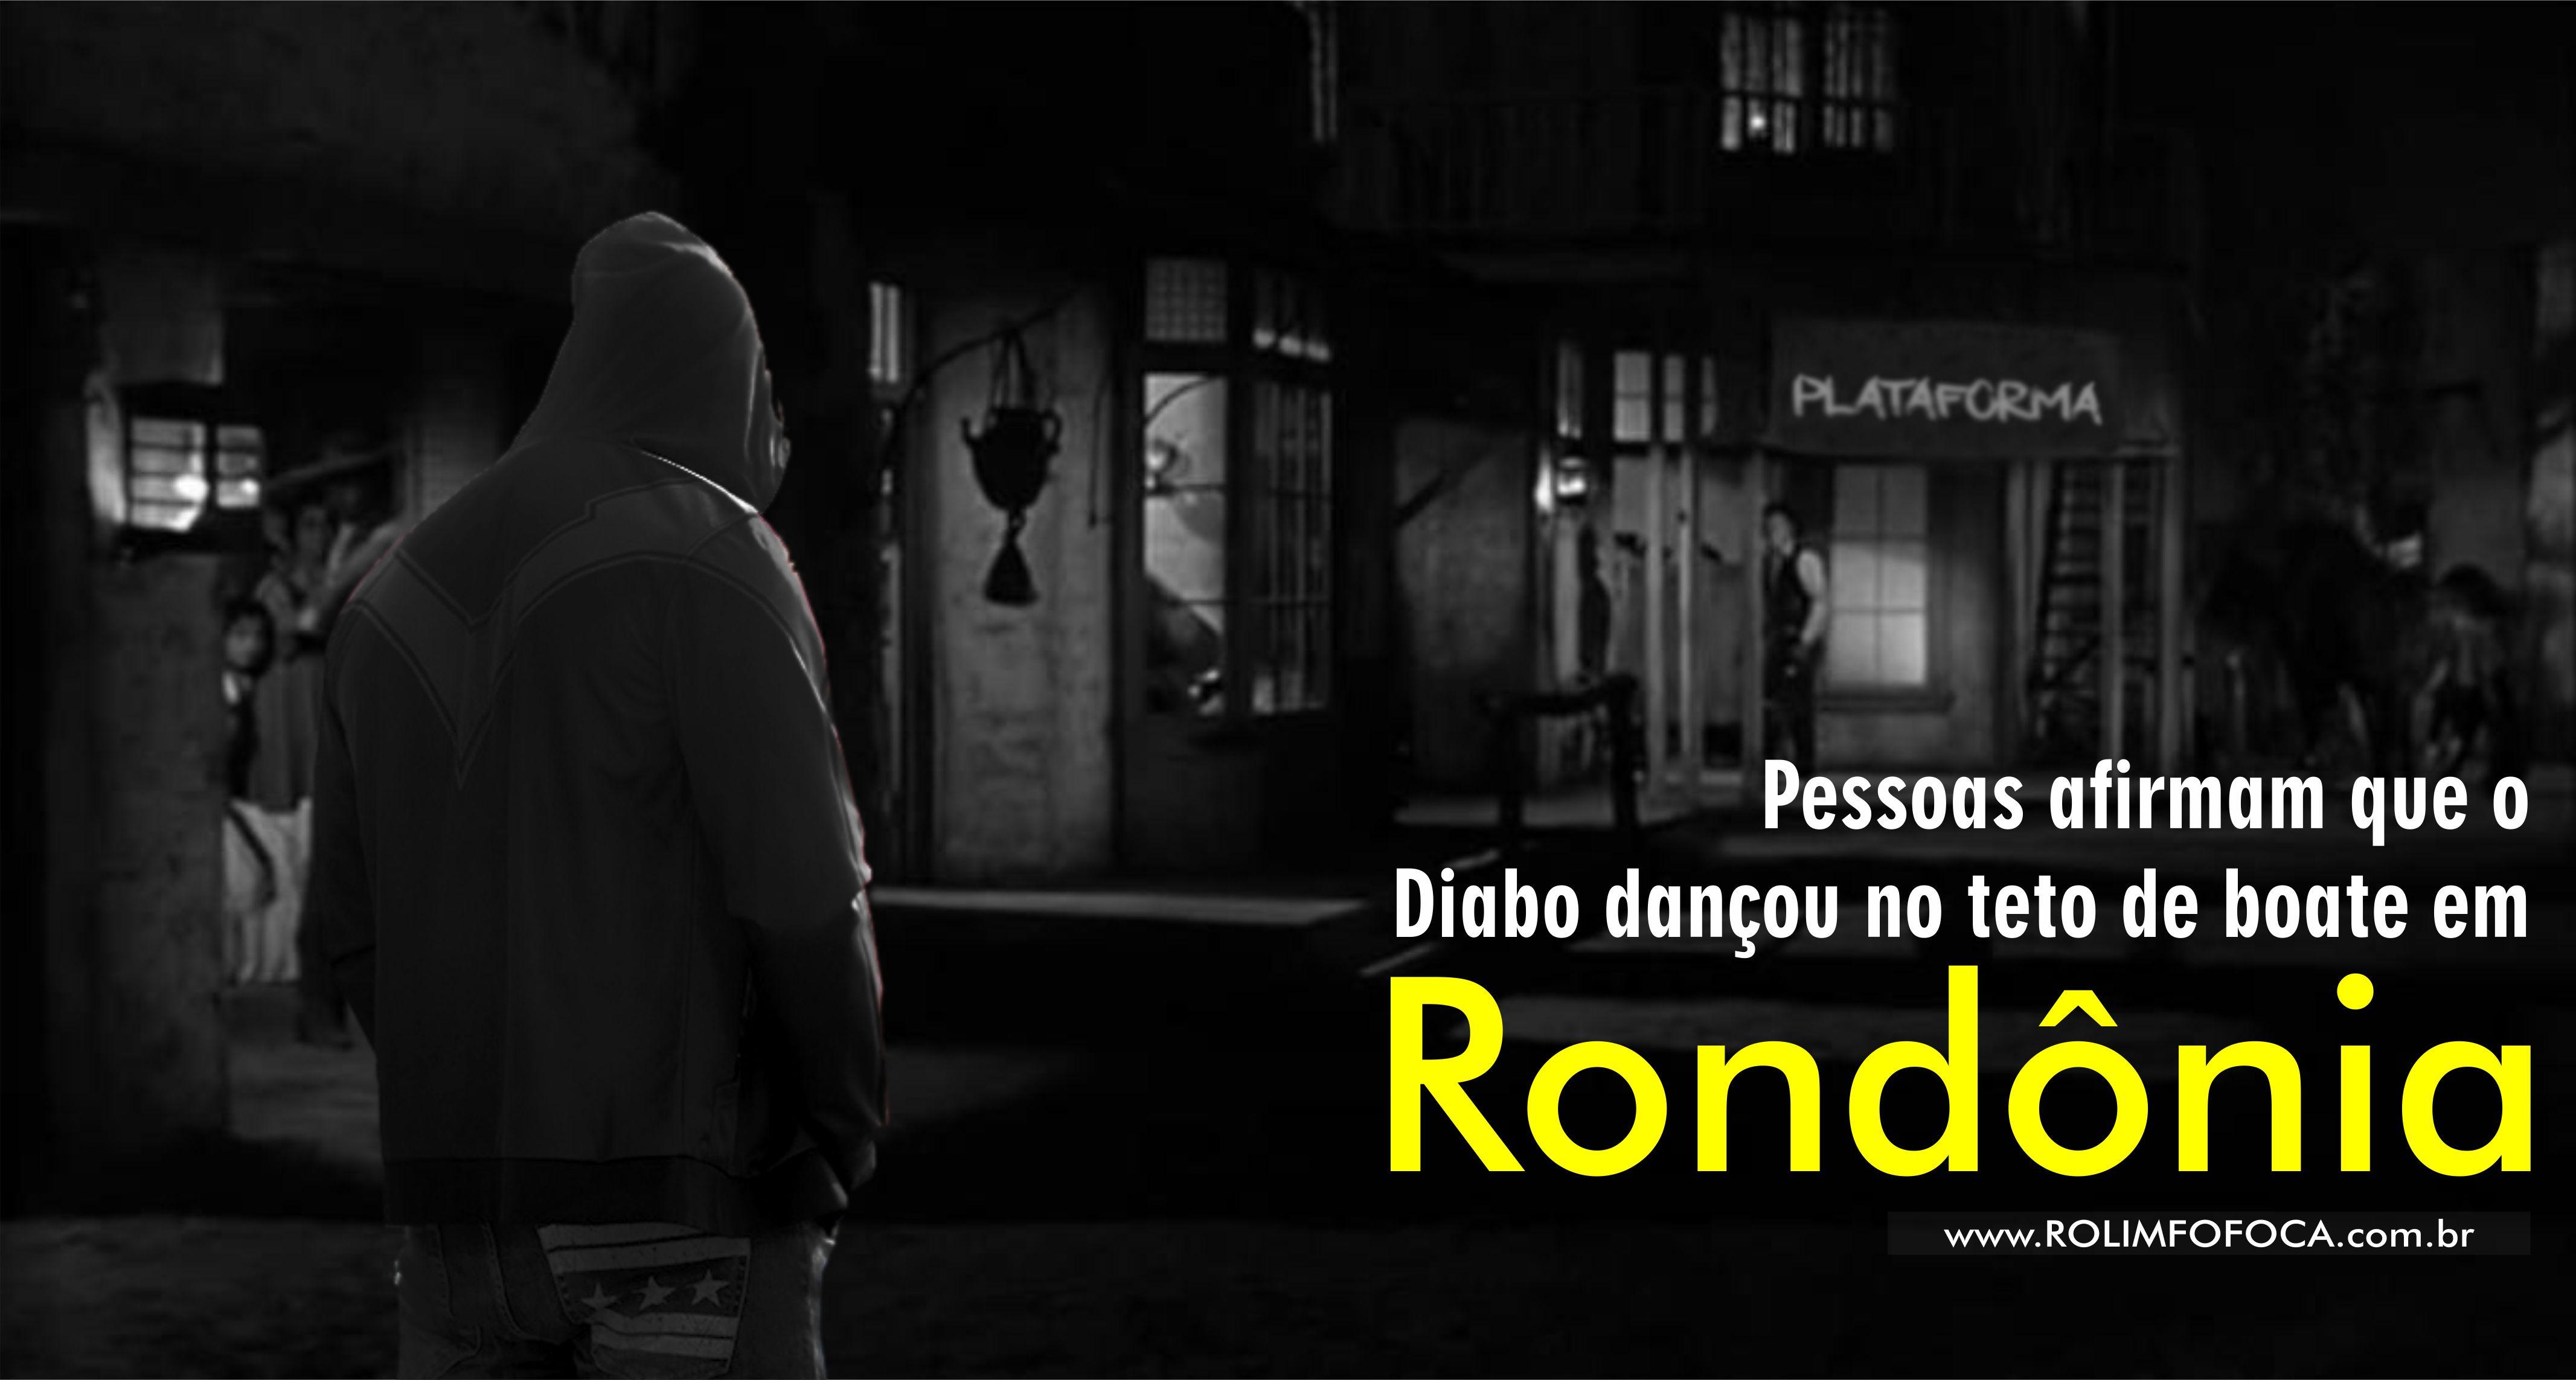 diabo dança em boate de rondonia-plataforma-rolim fofoca